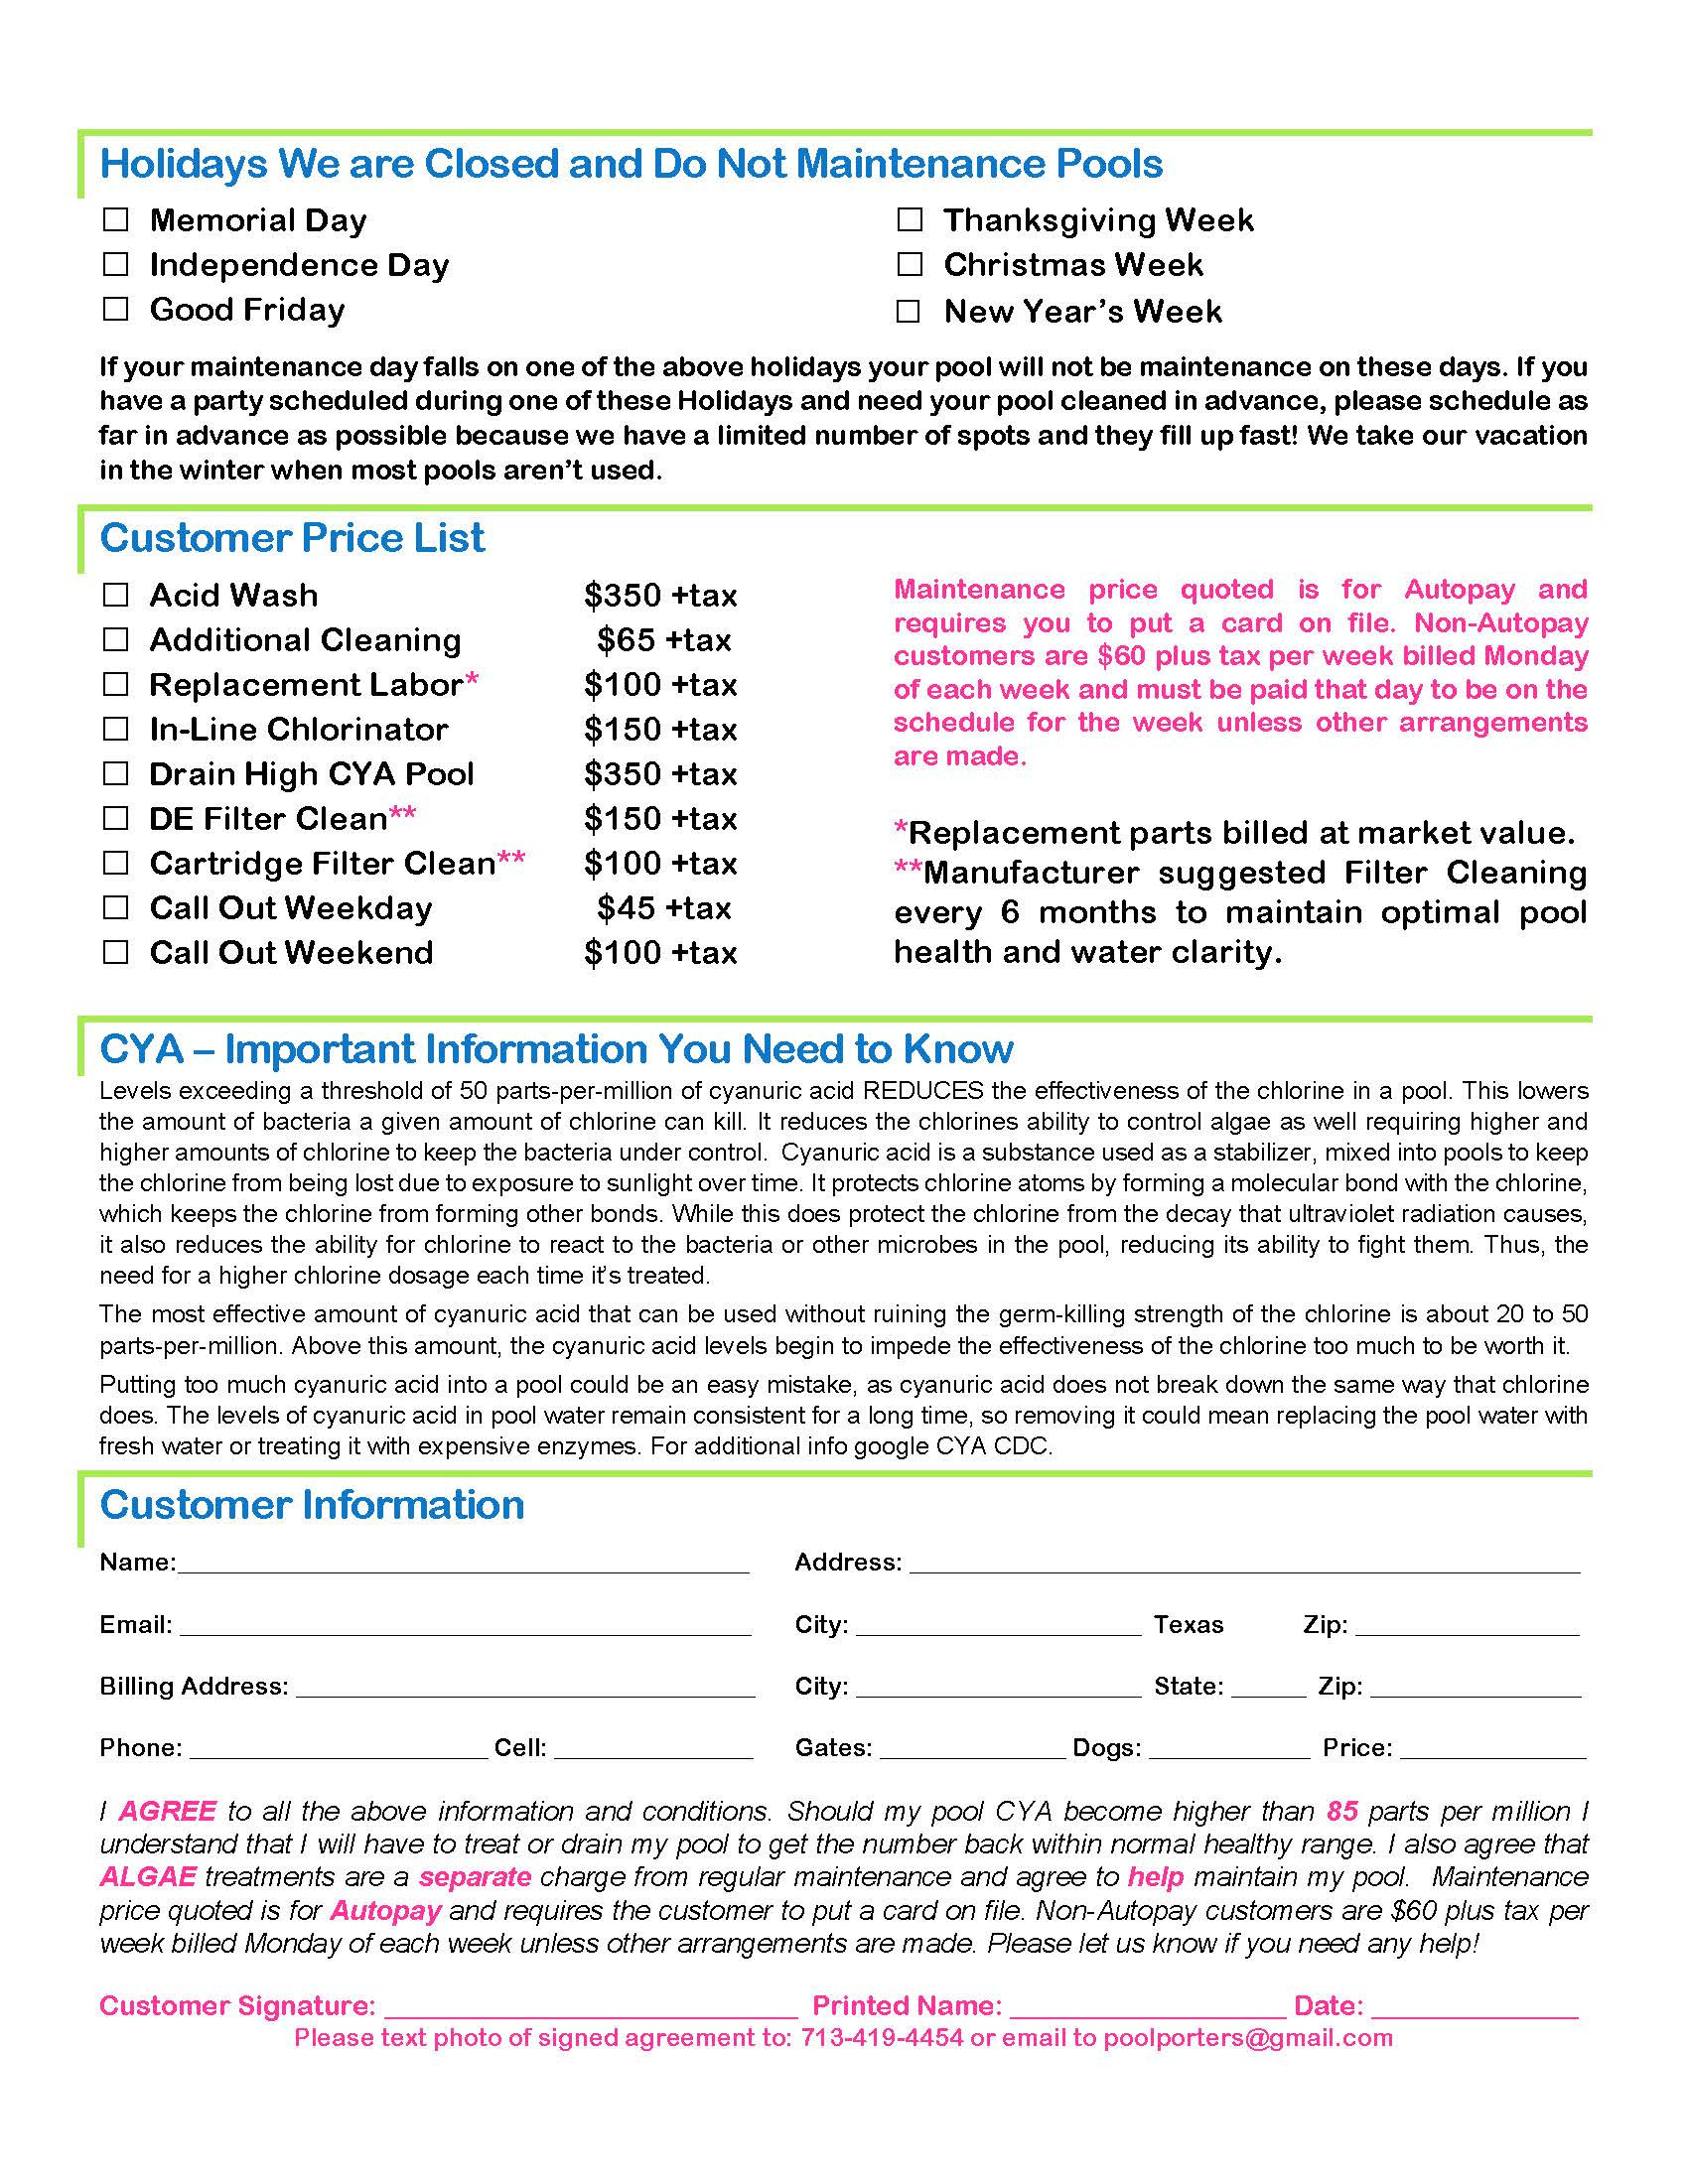 Pool Care Checklist Final_Page_2.jpg